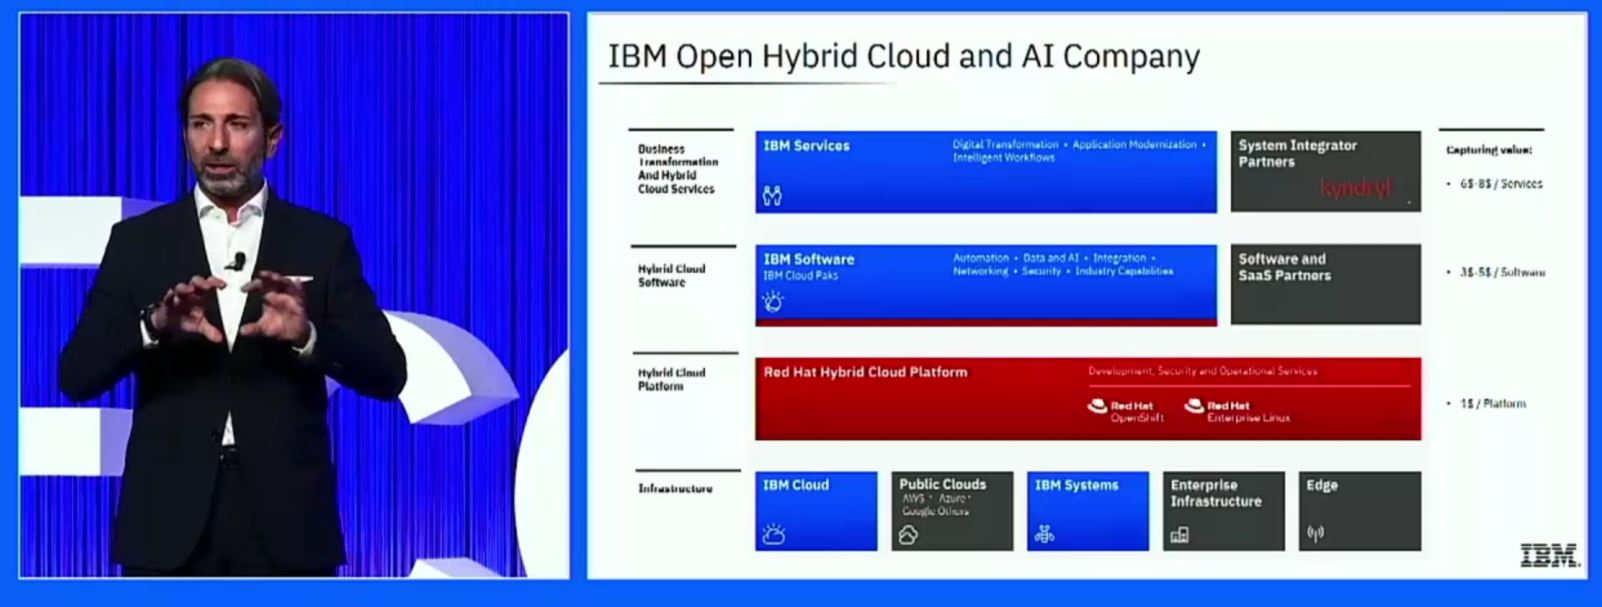 IBM - Strategia AI e Hybrid cloud